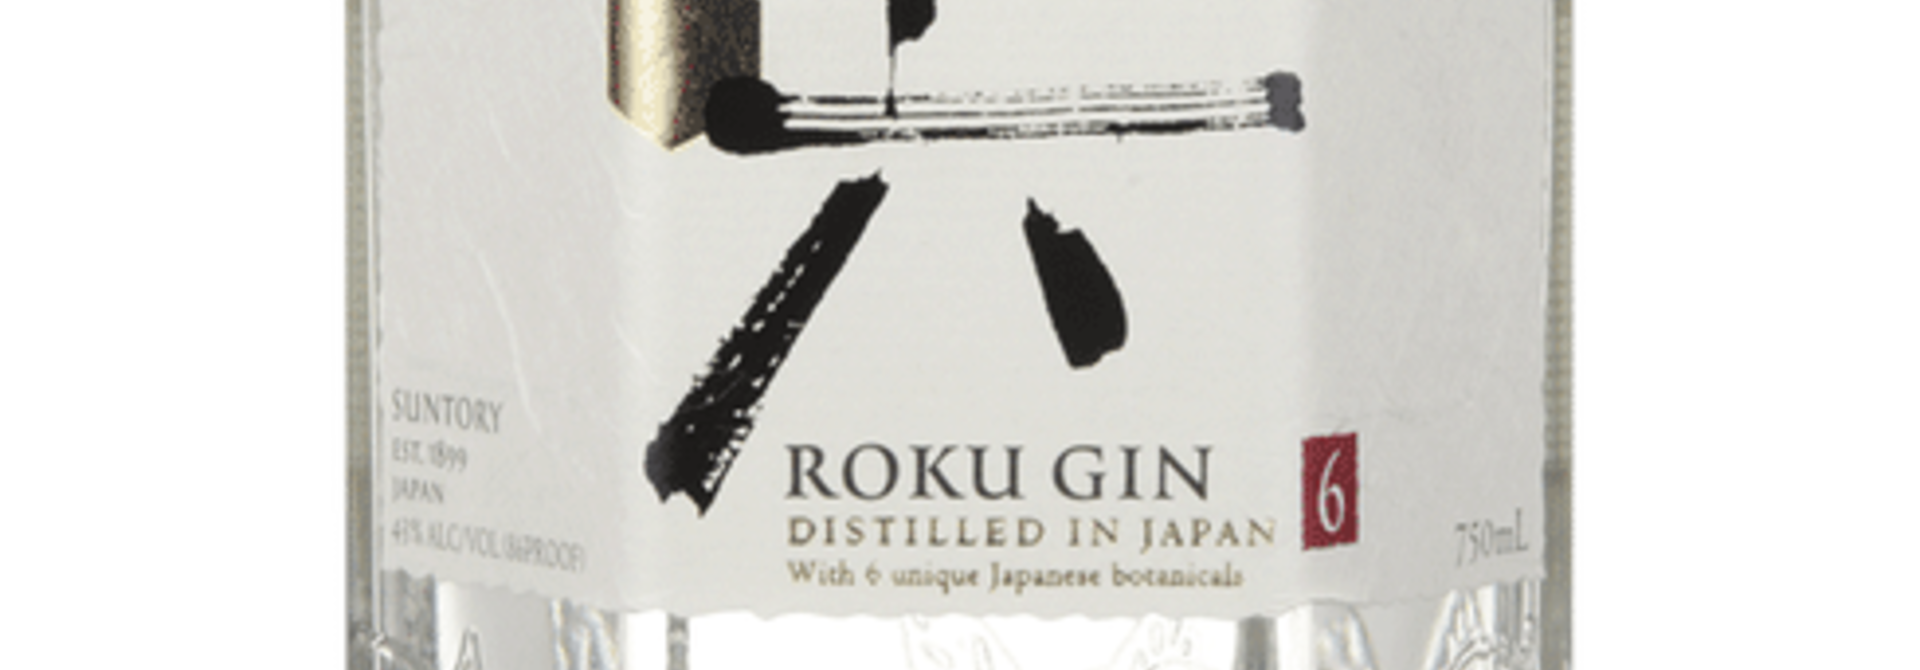 ROKU Gin 0.7ltr